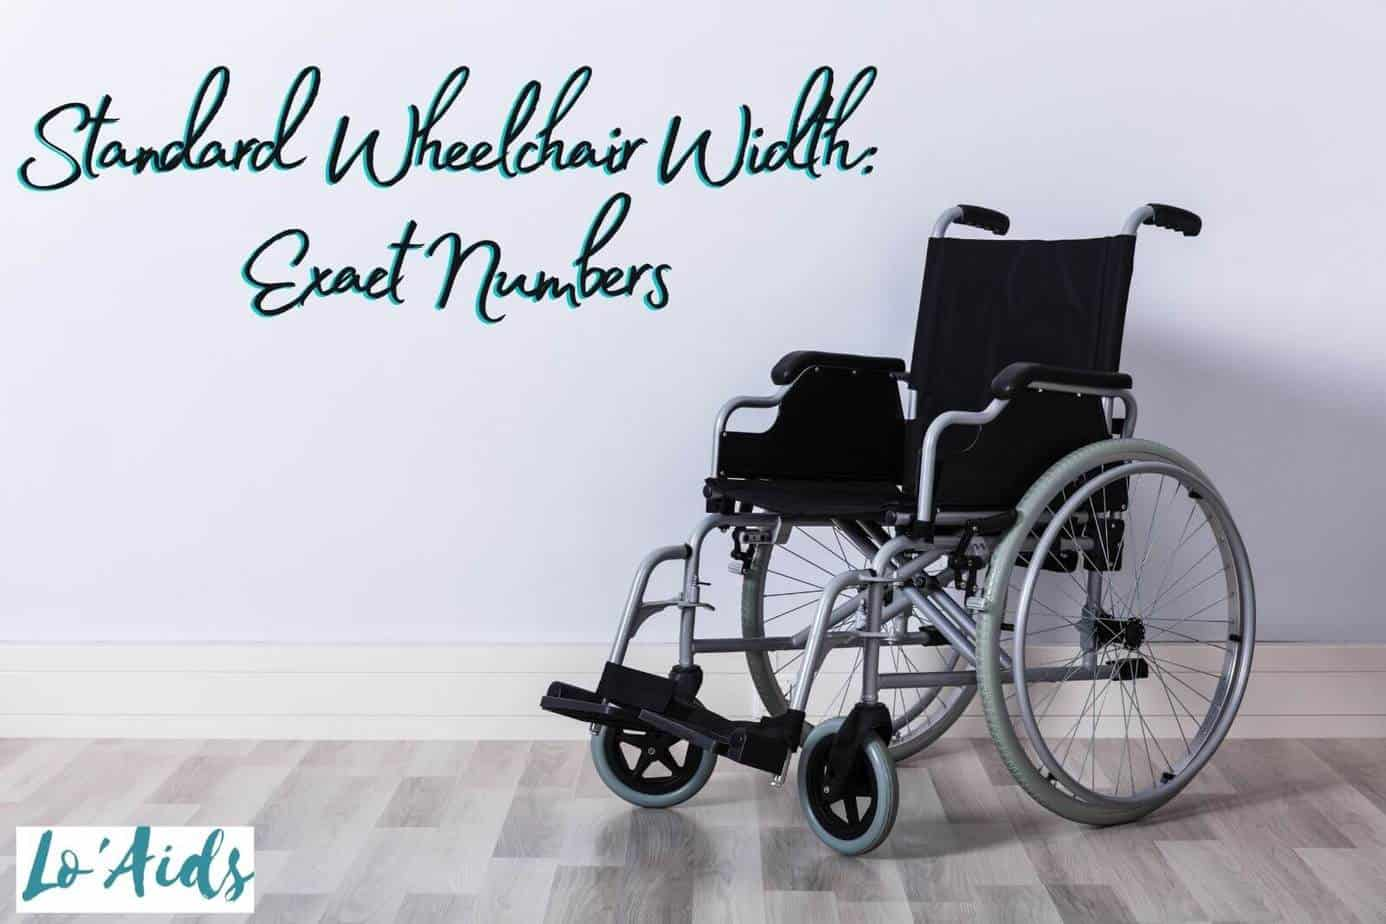 a wheelchair with standard wheelchair width